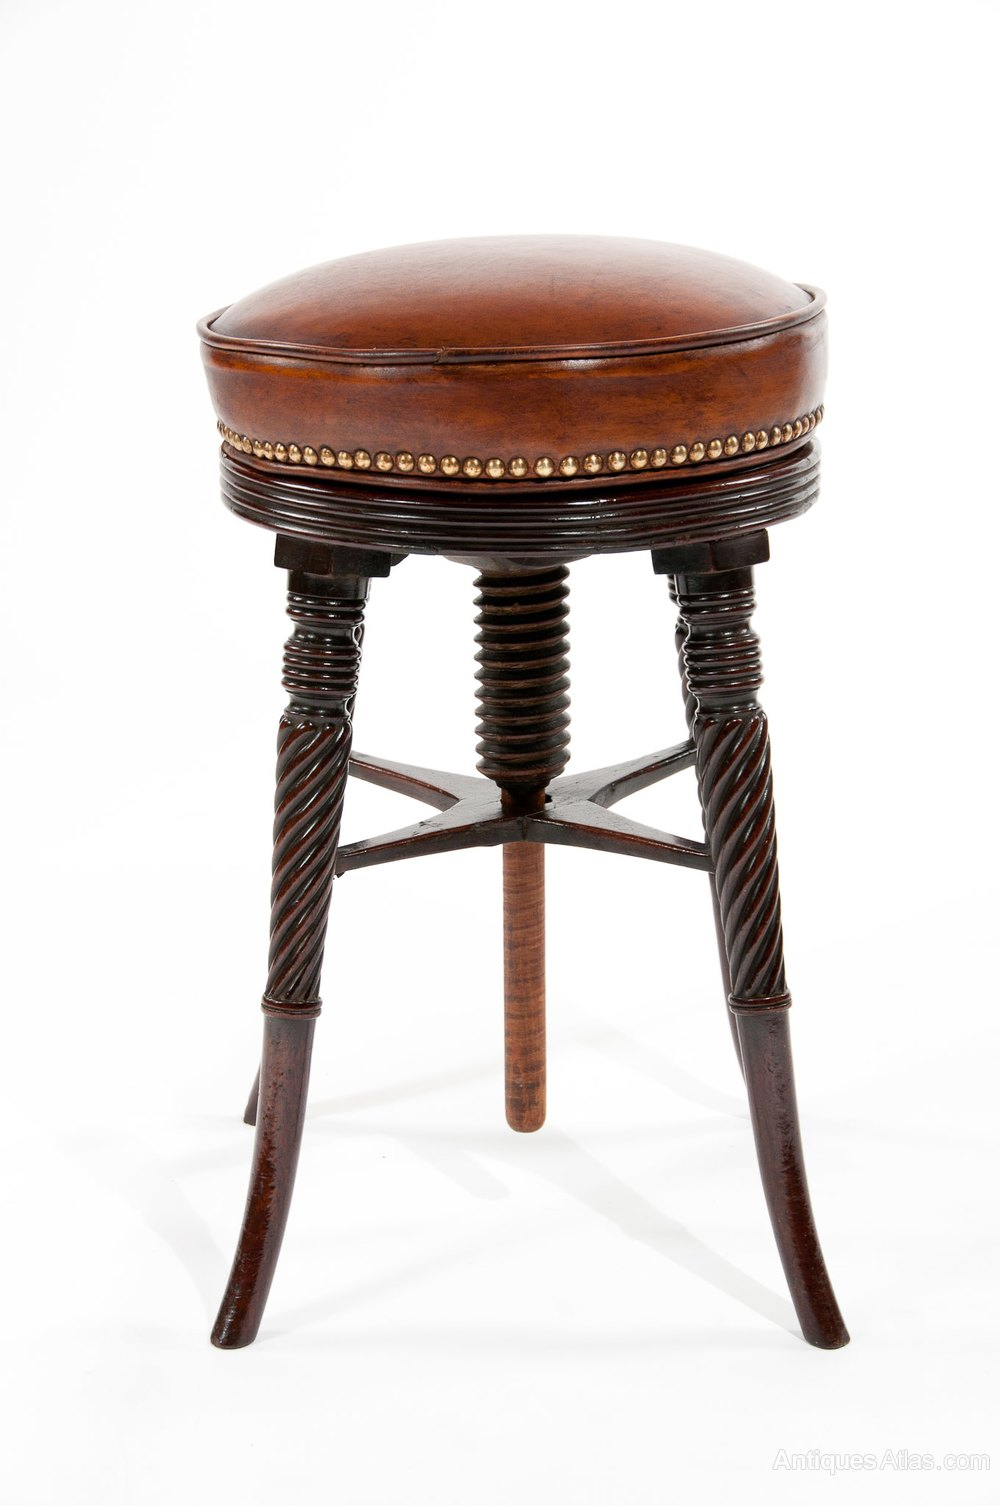 A Fine Regency Mahogany Adjustable Piano Stool Antiques